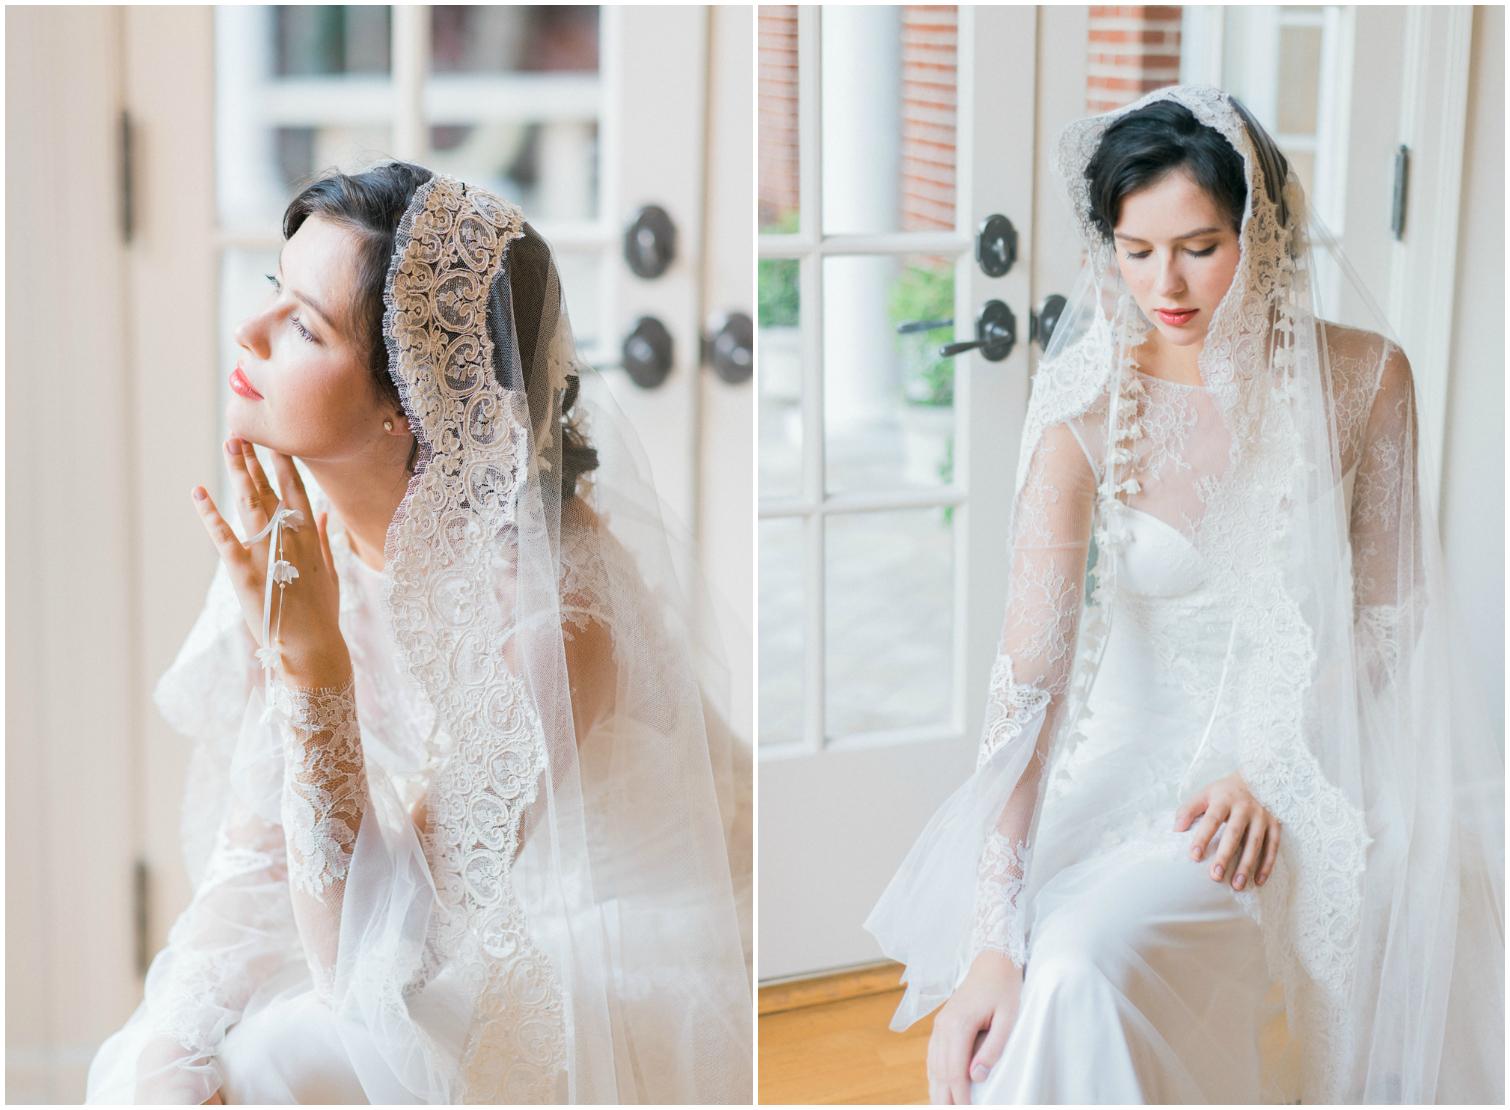 ©-celine-chhuon-Mariage-robes-Claire-Pettibone-gothicangel (2).jpg